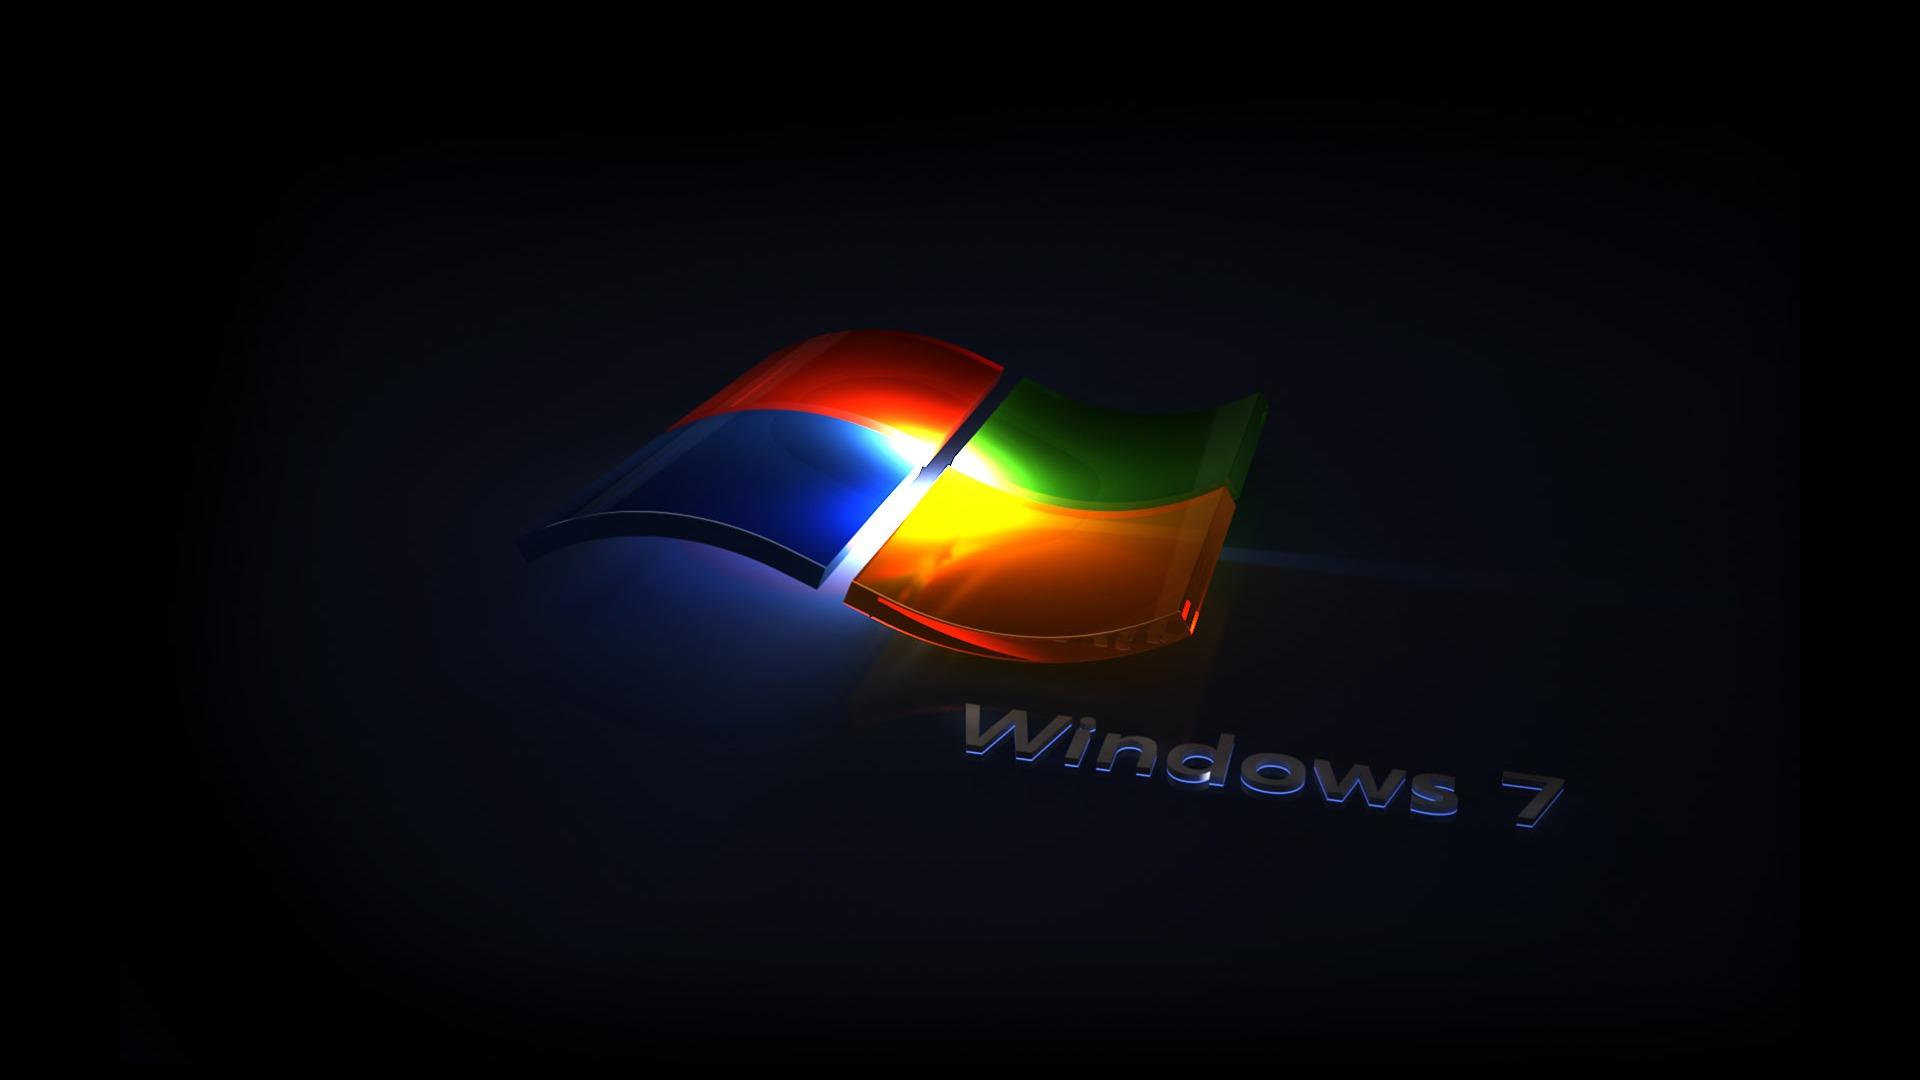 Windows7のテーマの壁紙 2 18 19x1080 壁紙ダウンロード Windows7のテーマの壁紙 2 システム 壁紙 V3の壁紙